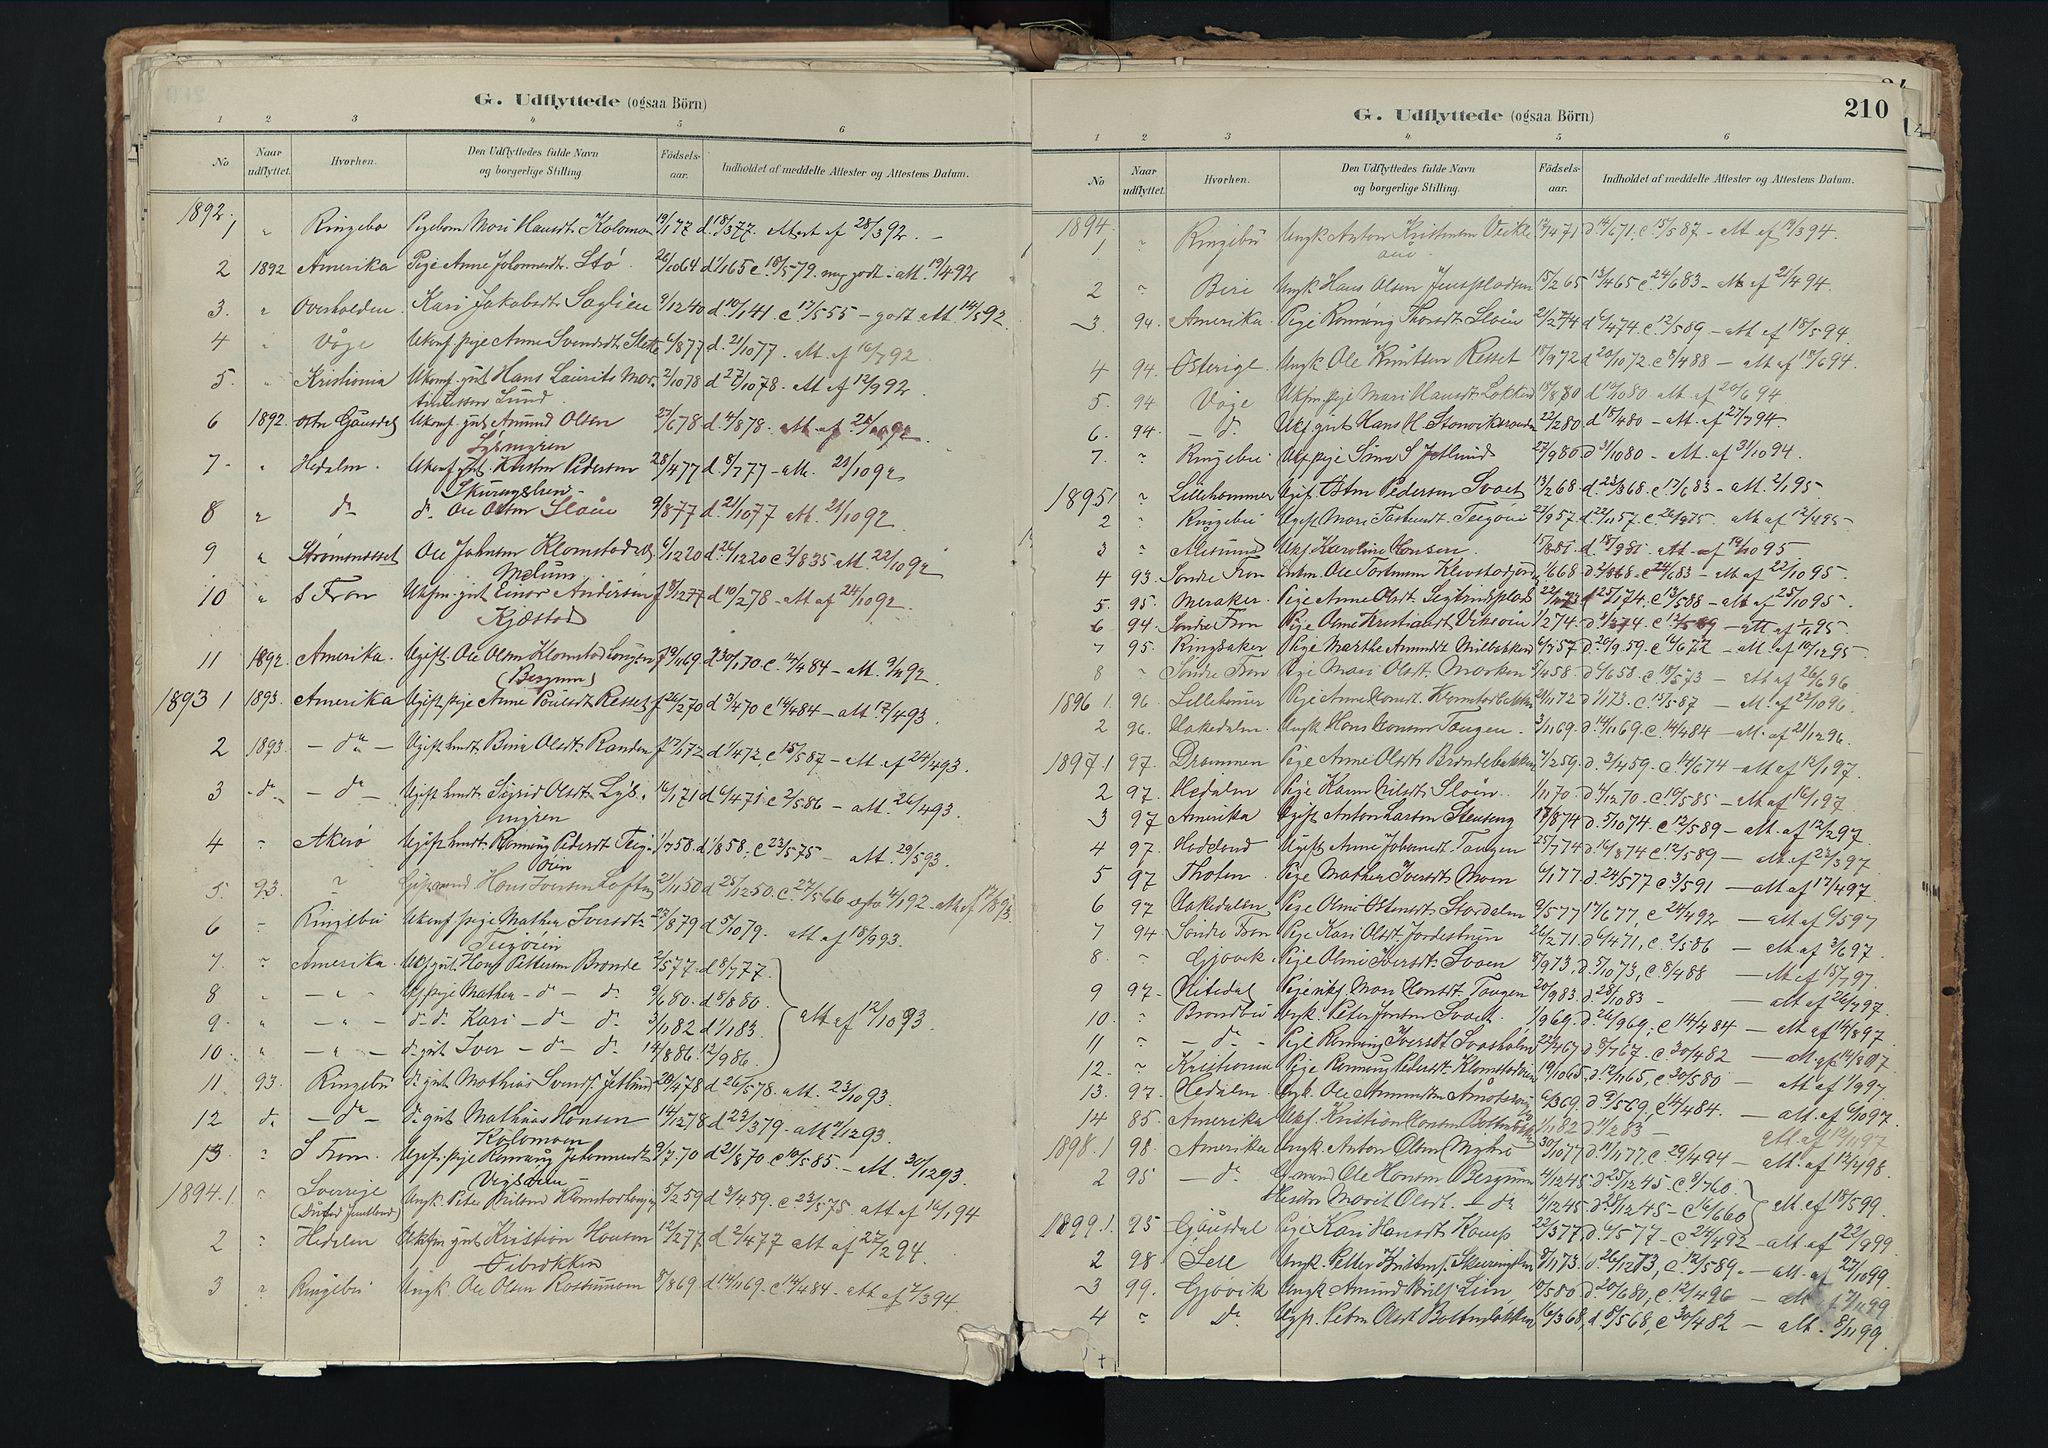 SAH, Nord-Fron prestekontor, Ministerialbok nr. 3, 1884-1914, s. 210